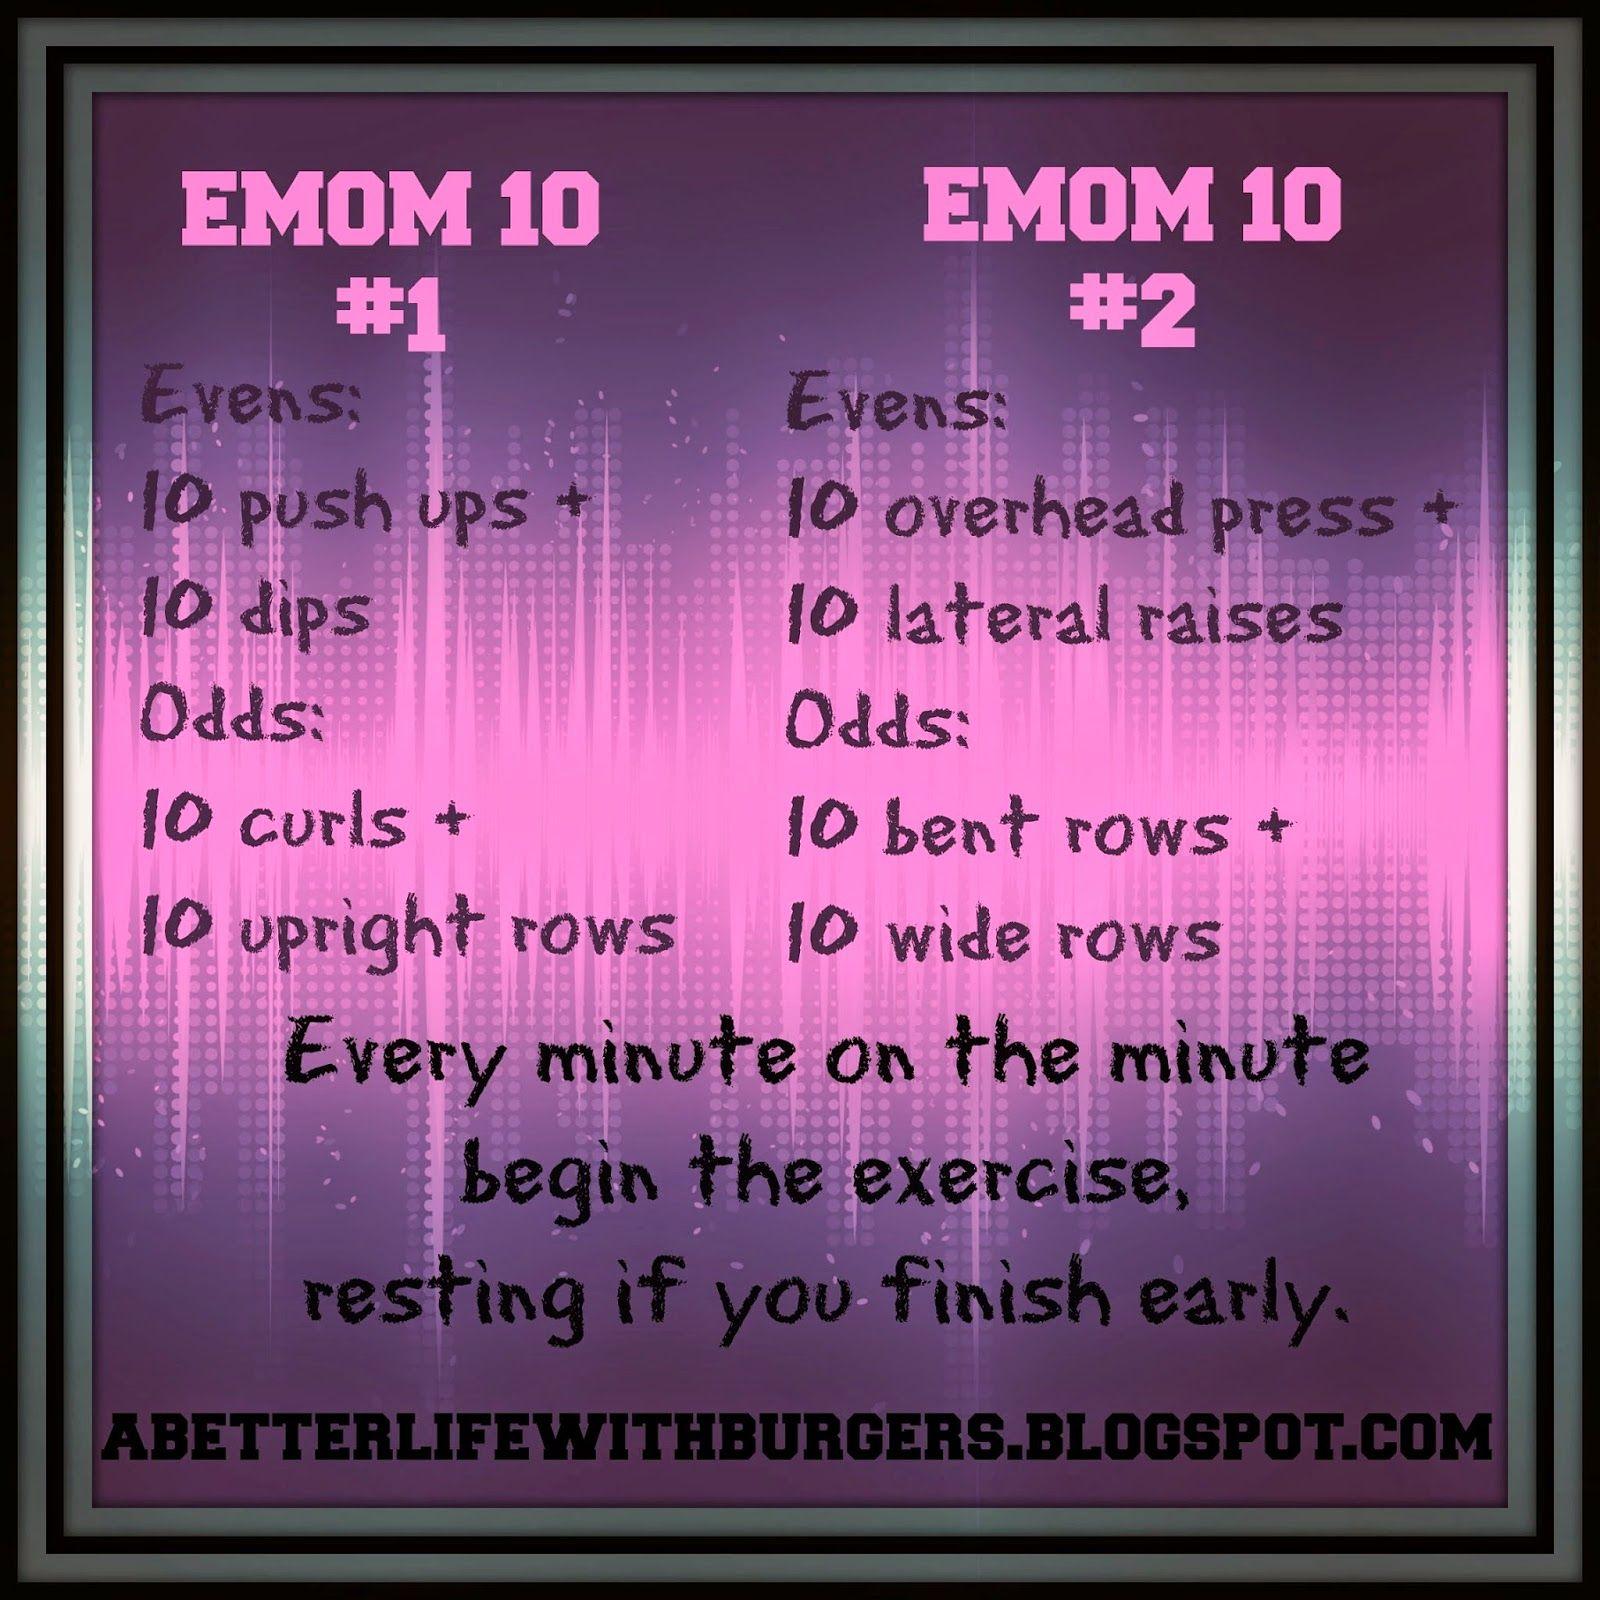 Emom Upper Body Workout Crossfit Emom Workout Workout